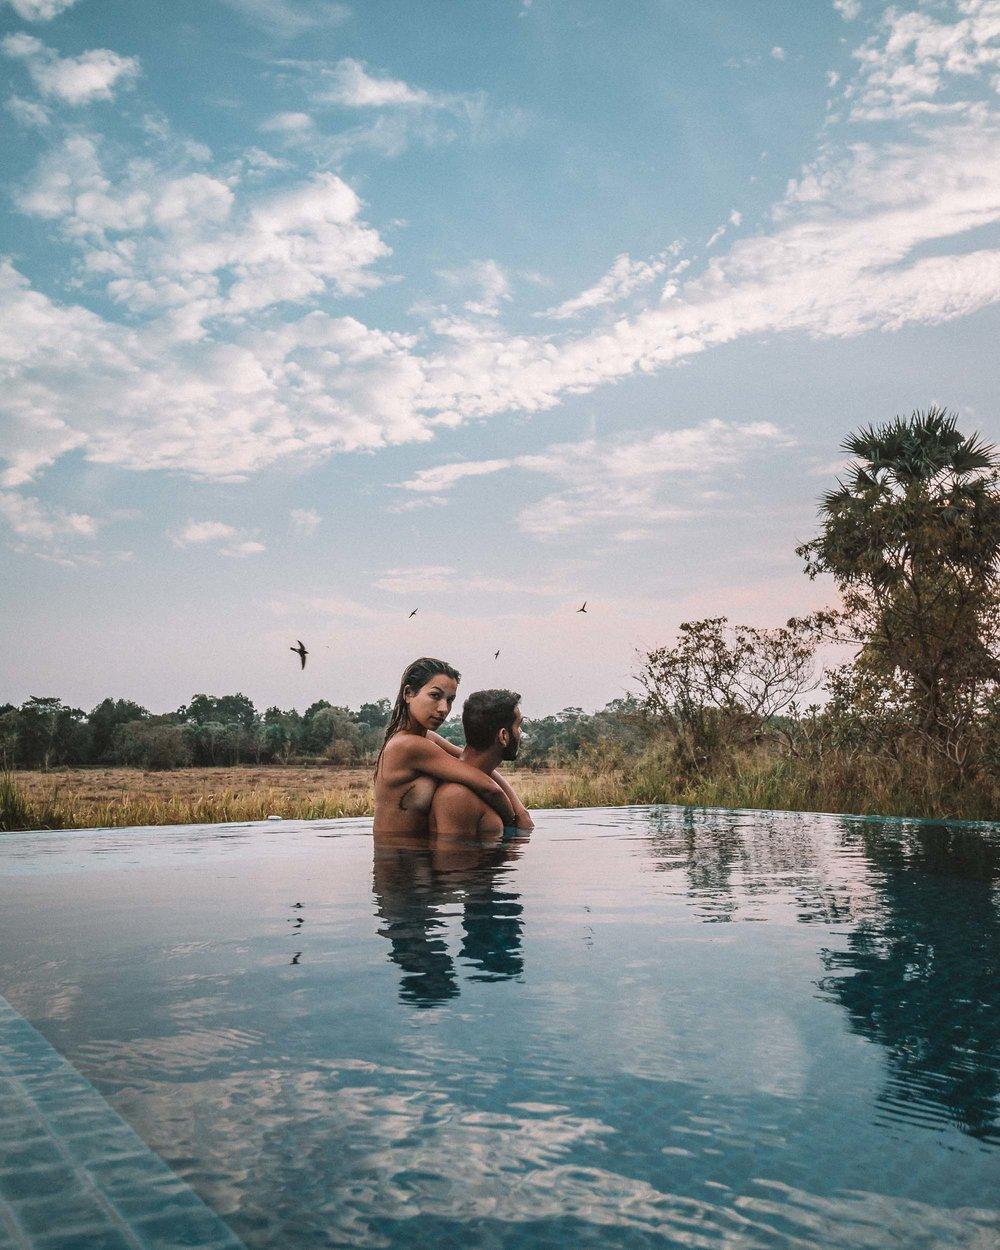 Anuradhapura ulagalla by uga escapes heritage culture Sri Lanka pool villa rice fields view couple time